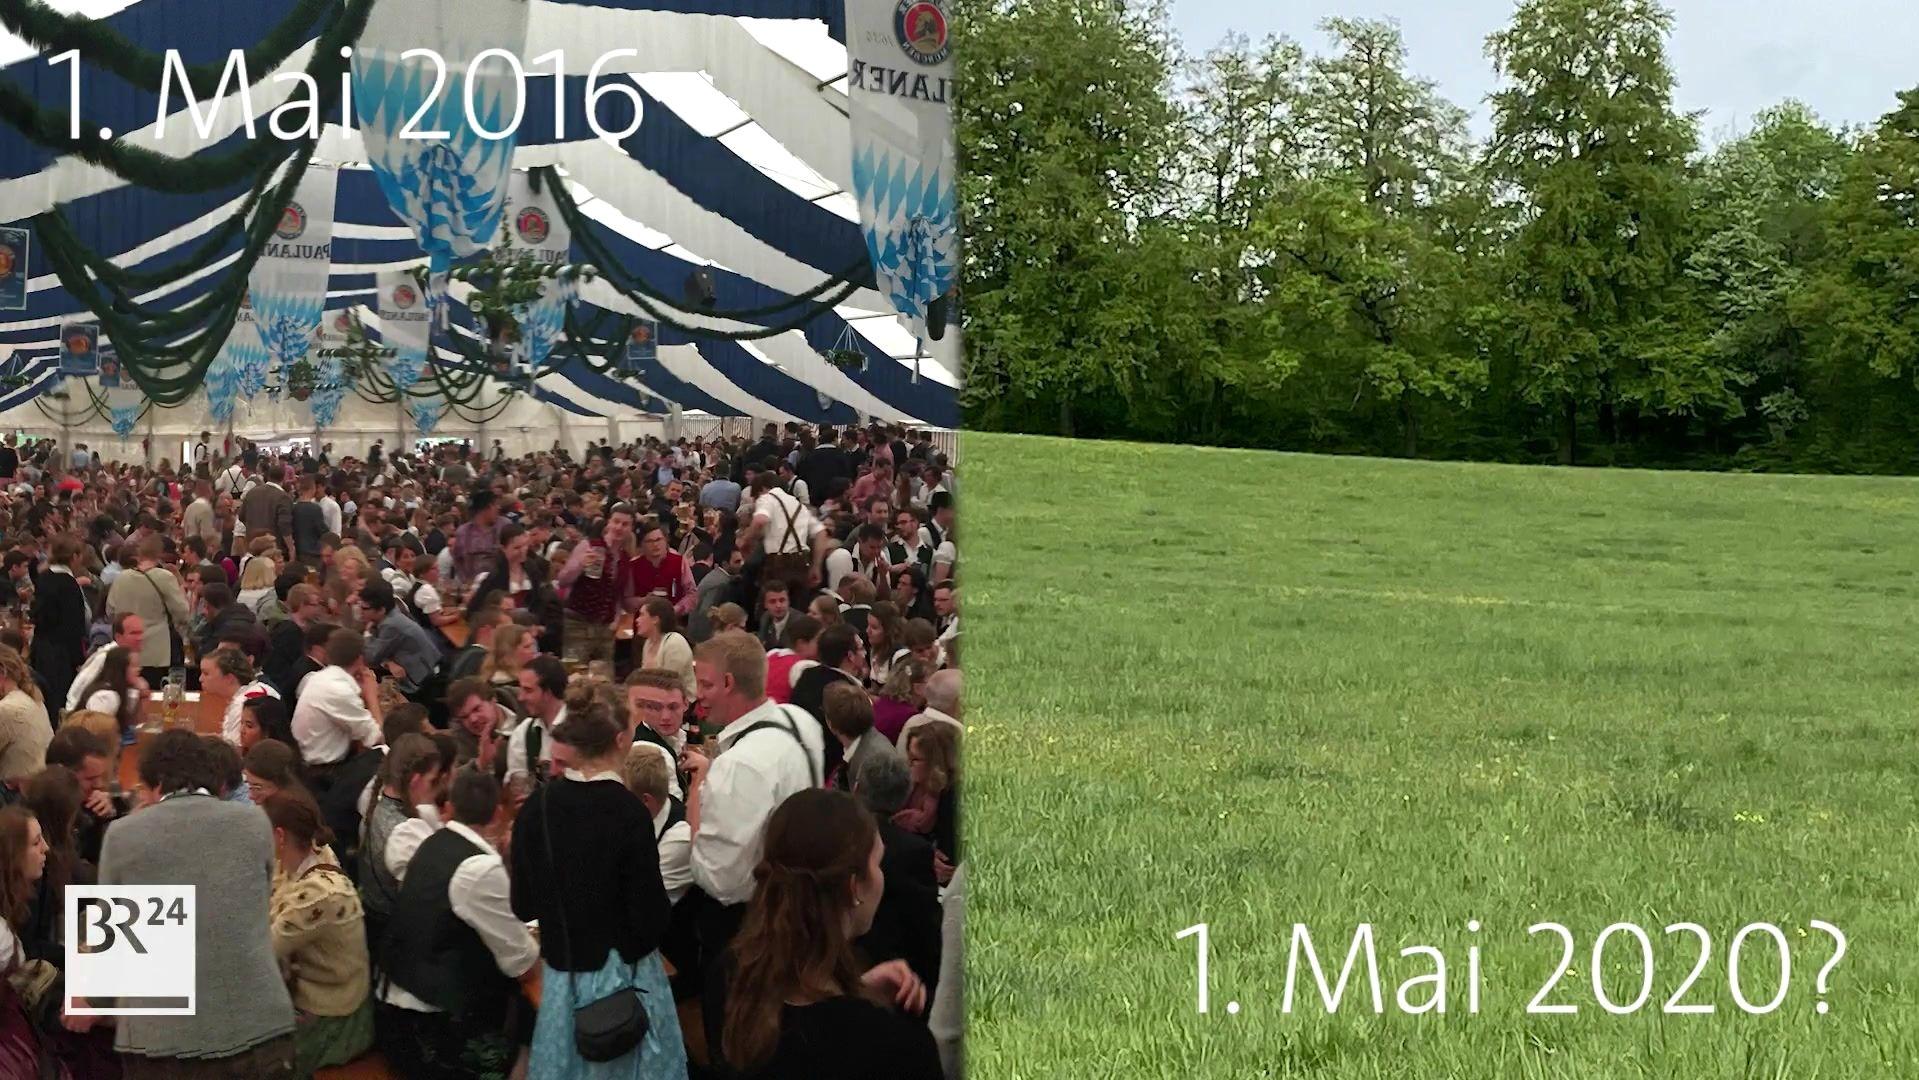 1. Mai 2016: Volles Bierzelt, 1. Mai 2020: Leere Wiese